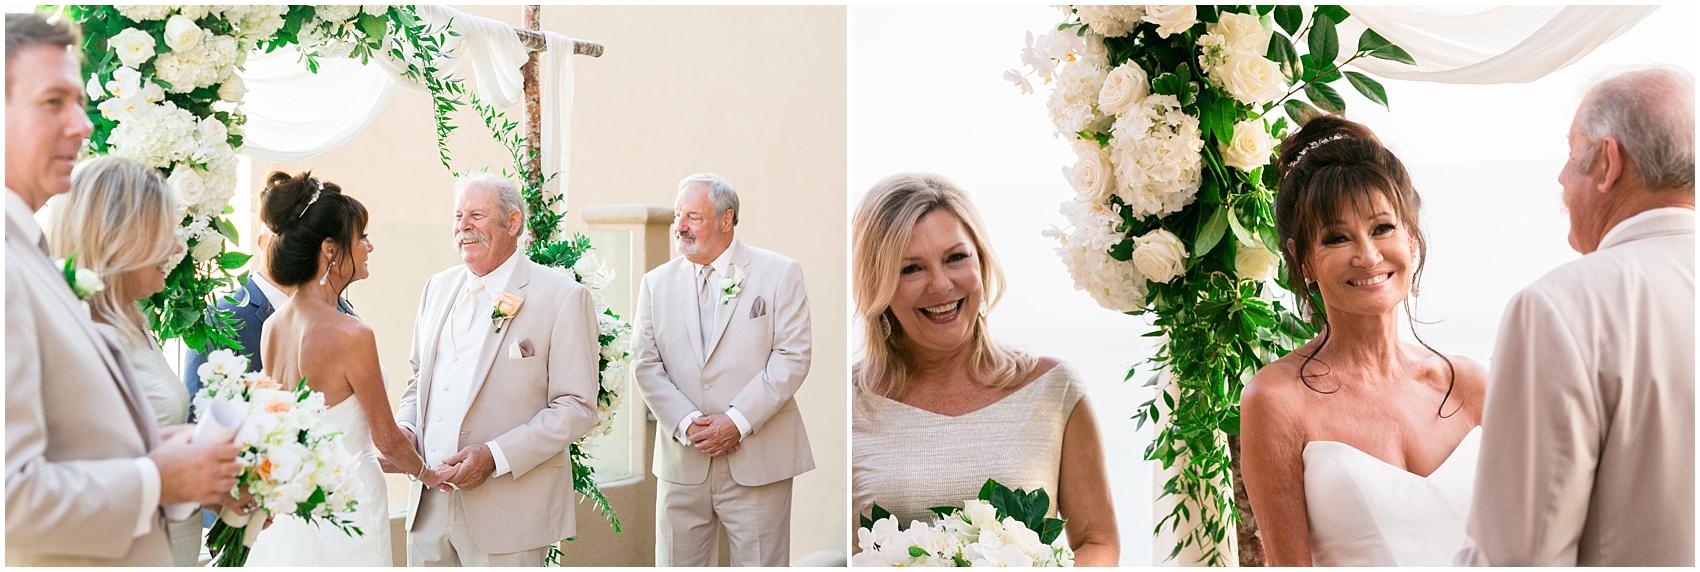 Rena and Louis_ Wedding-0394.jpg